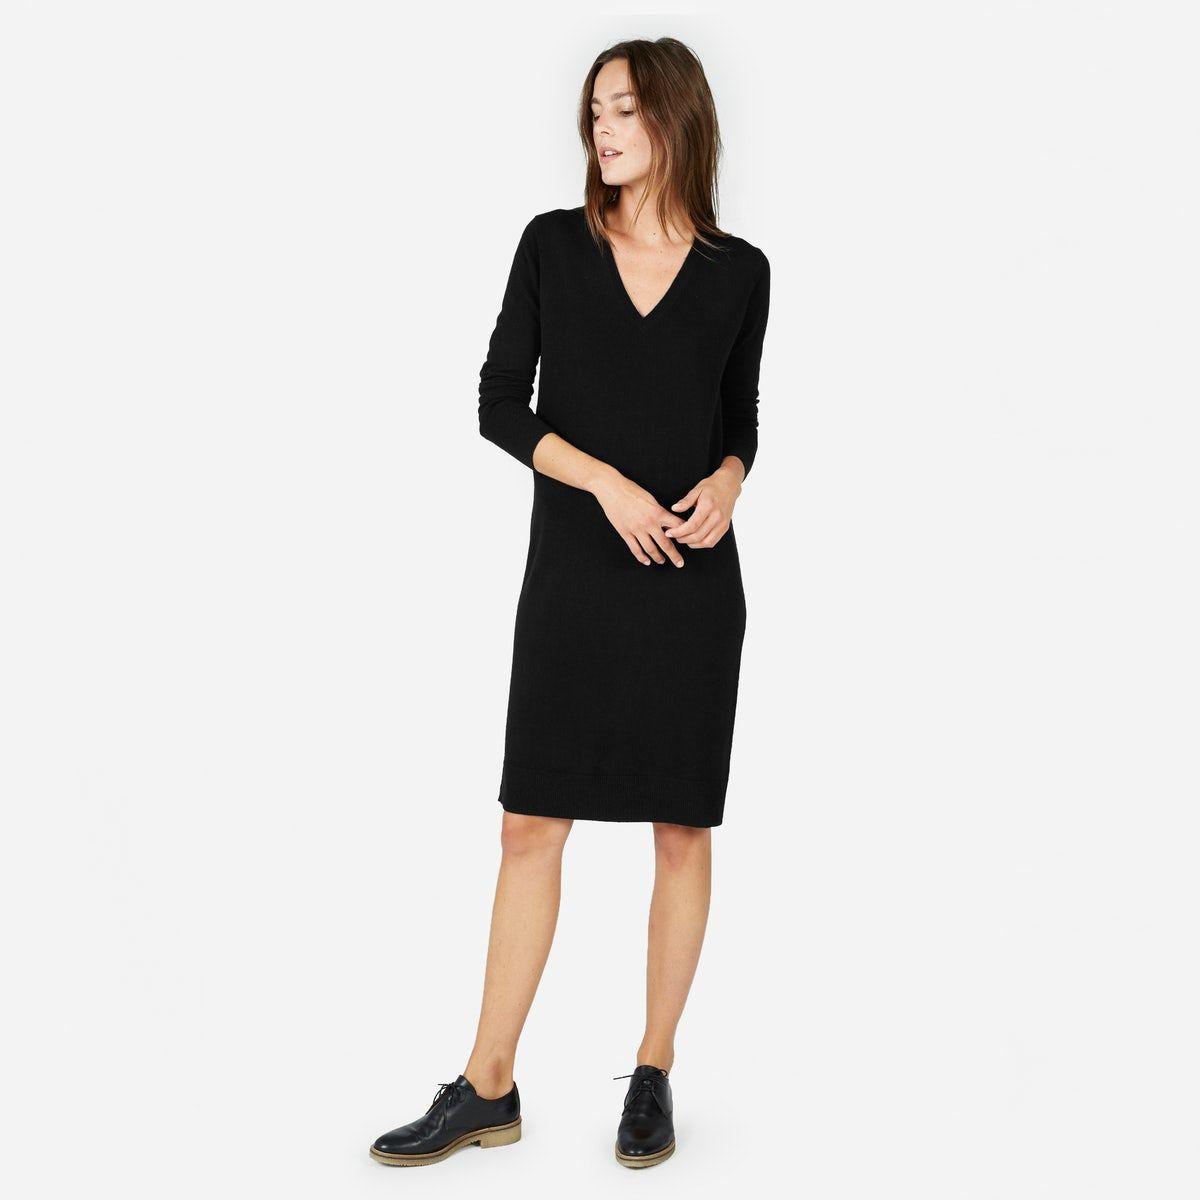 d4117dcabf6 Women s The Cashmere V-Neck Midi Dress